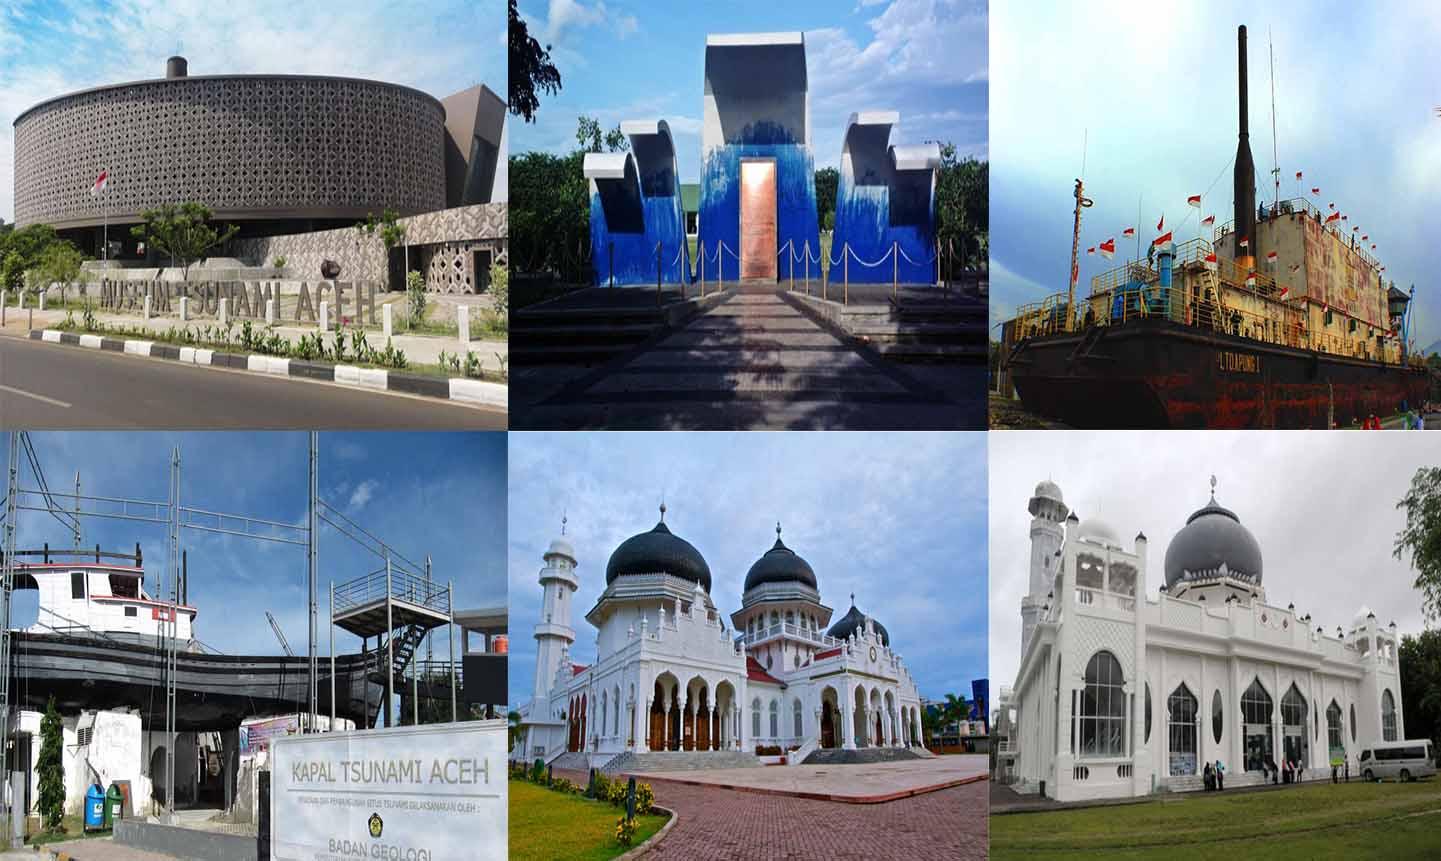 Inilah 6 Objek Wisata Untuk Mengenang Tsunami Aceh